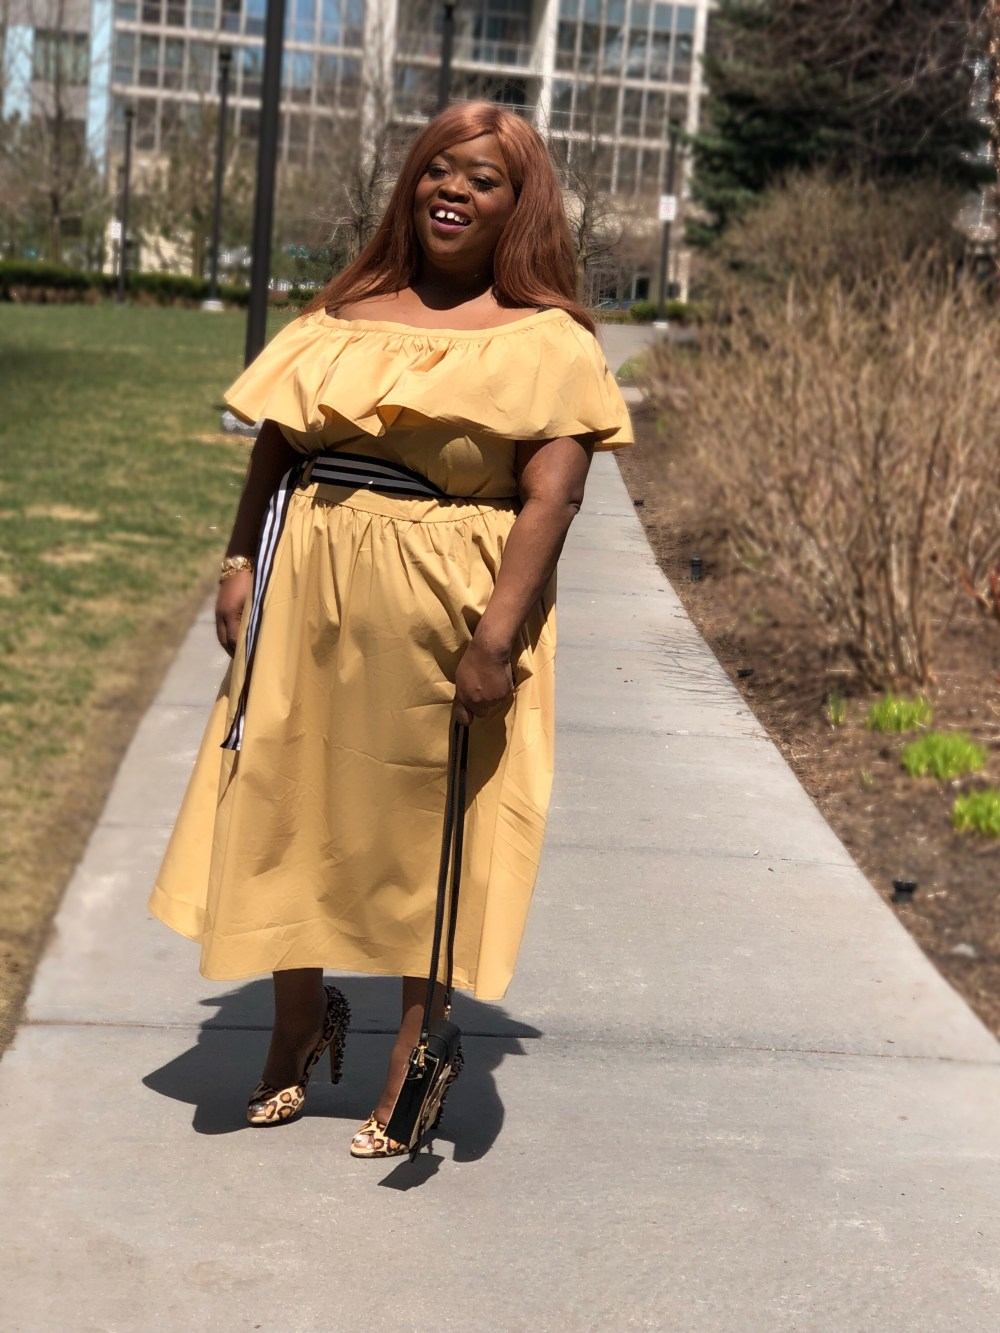 plus size fashion Shoulder Ruffle Midi Dress - Who What Wear Tan - plus size - rivers island - sam eldman - plus size blogger